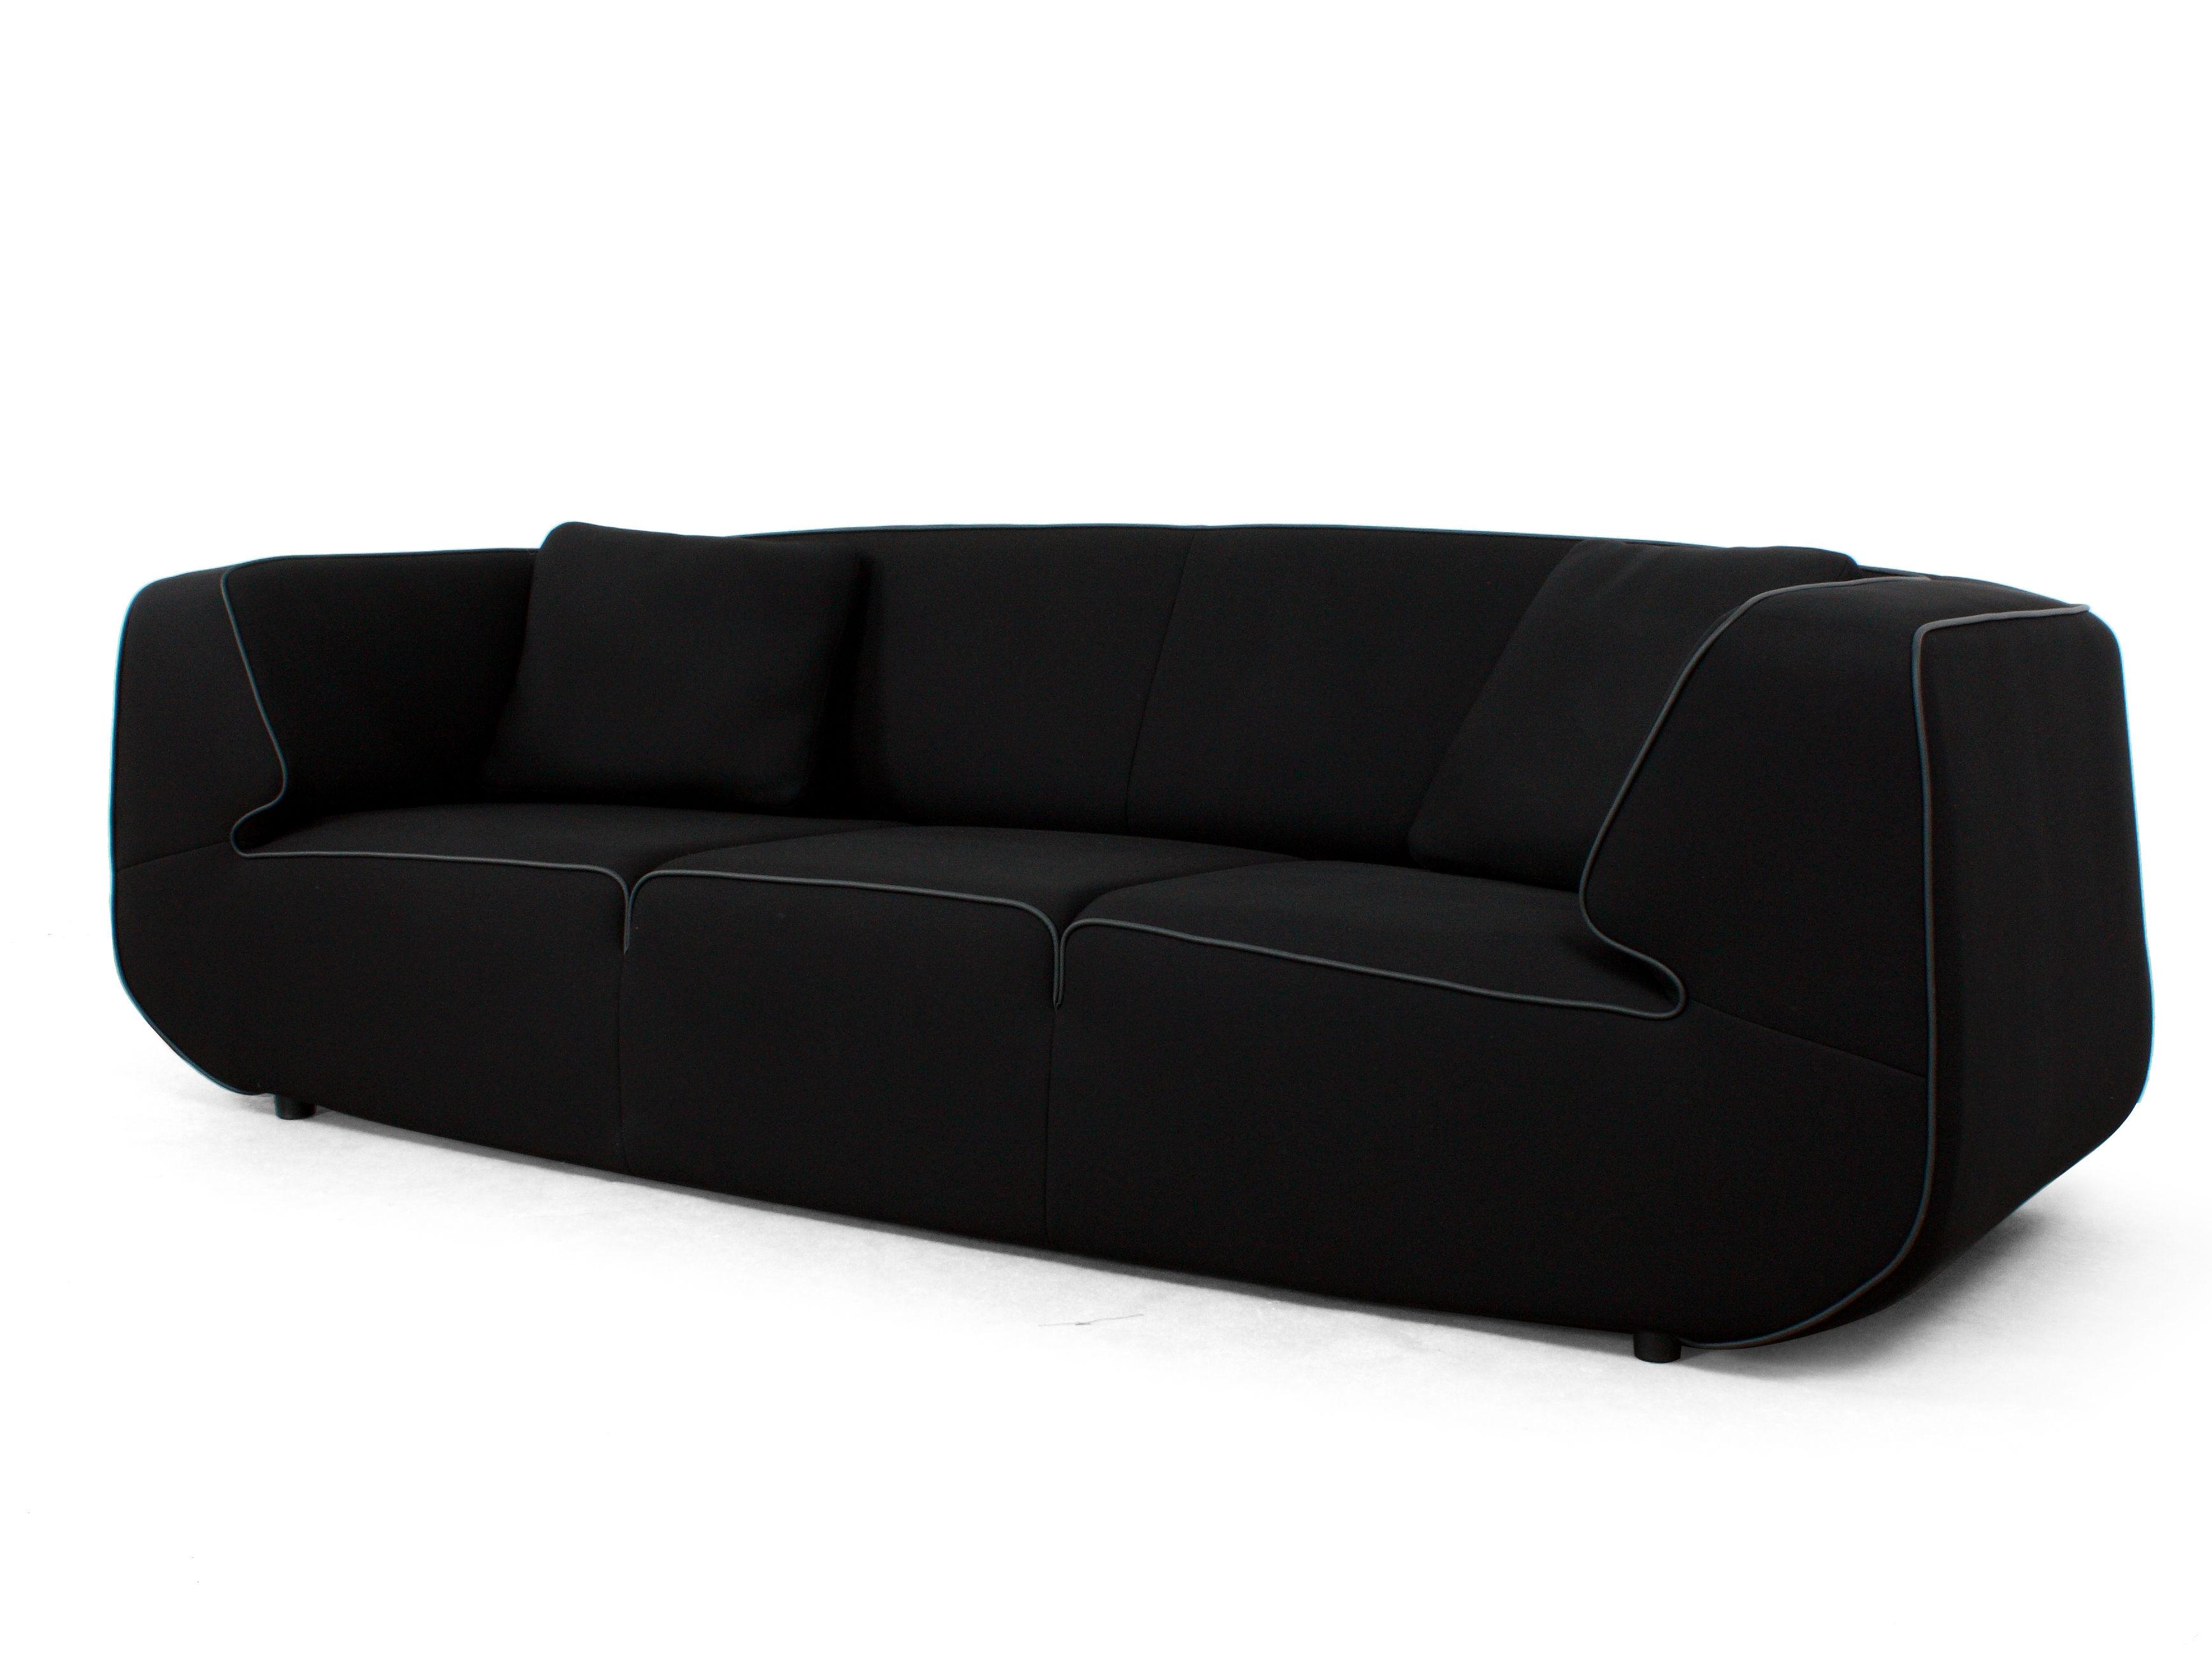 canap droit bump by ora ito xl 3 places l 238 cm. Black Bedroom Furniture Sets. Home Design Ideas